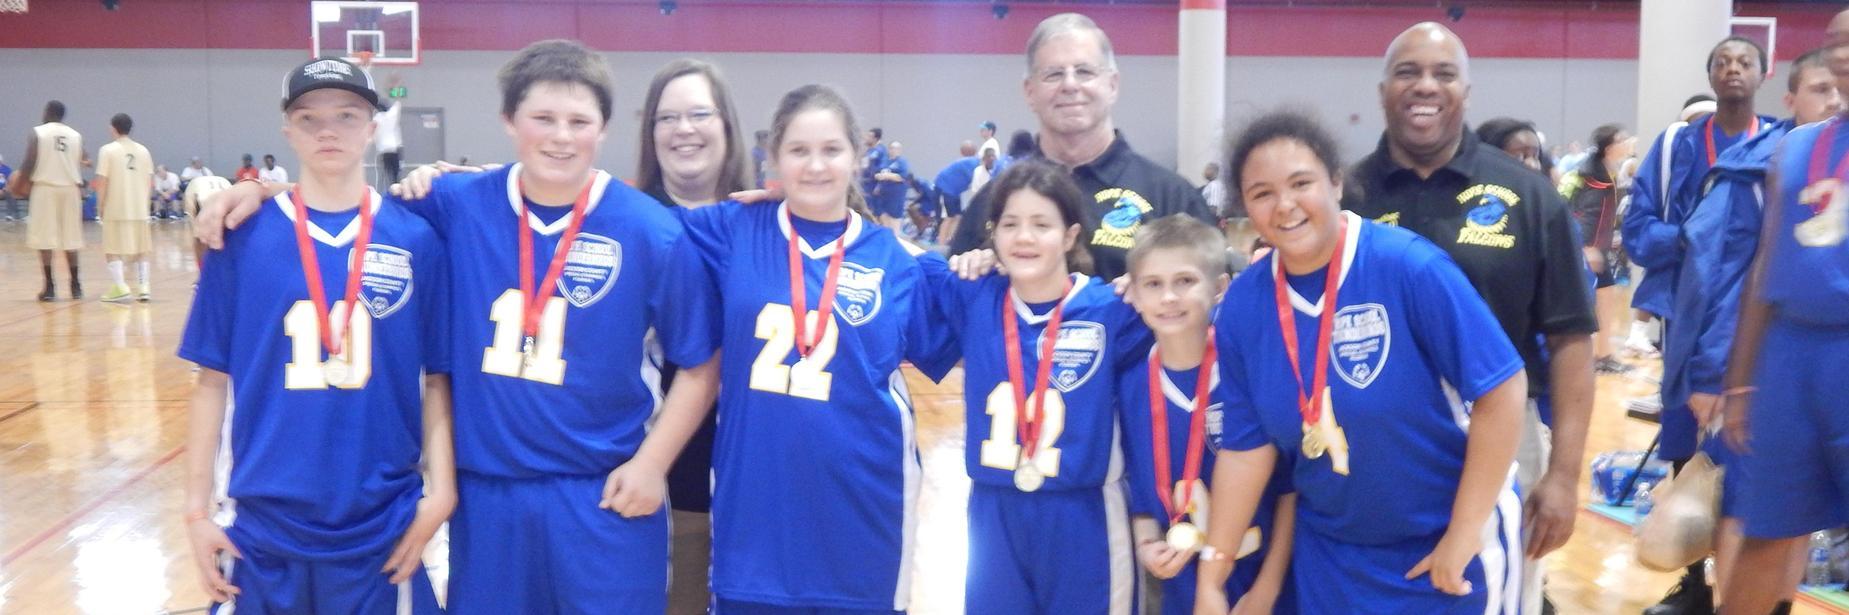 hope basketball team receiving medals